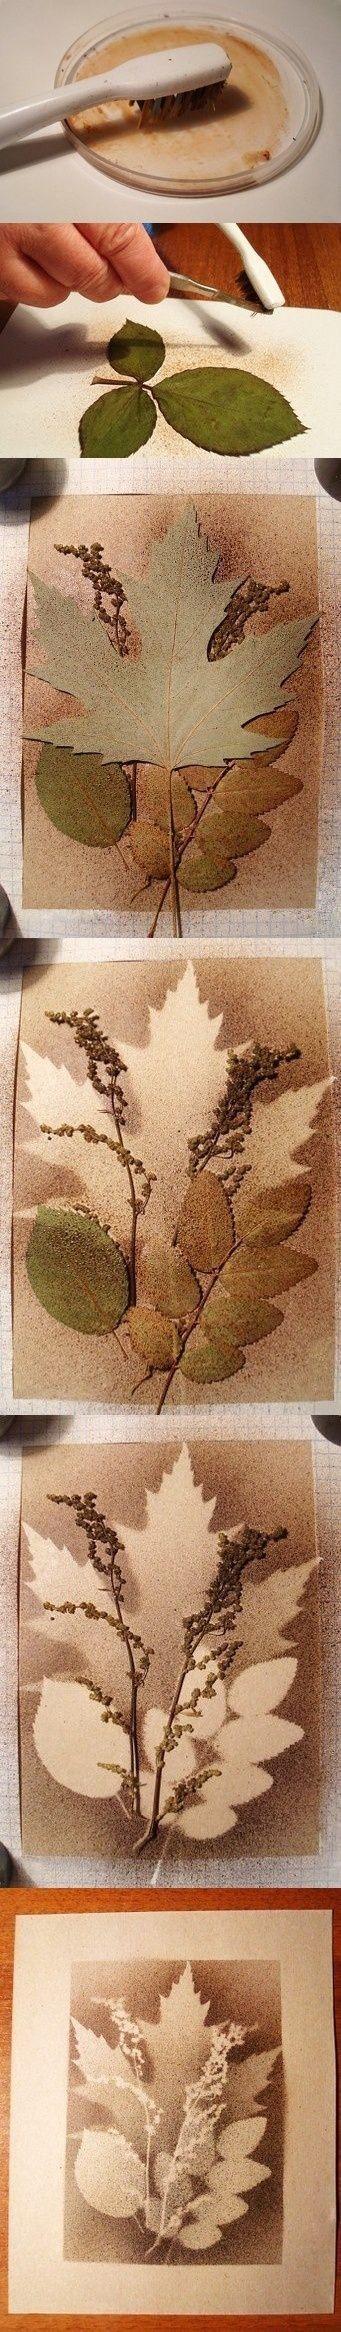 More leaf art